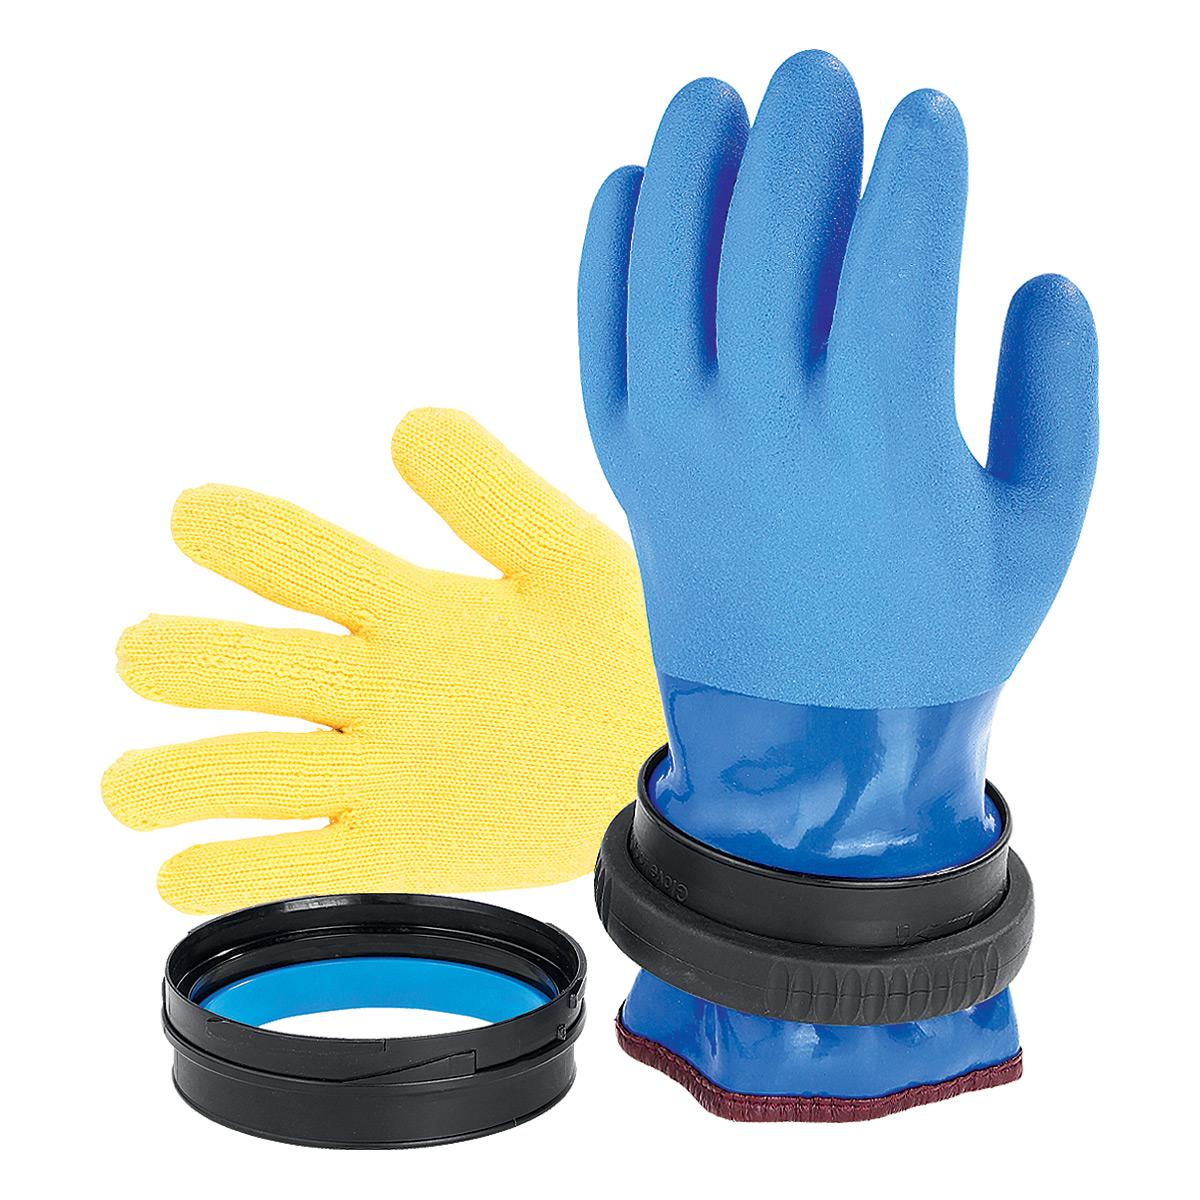 Сухи водолазни ръкавици DRY GLOVE за сух водолазен костюм - Scubapro